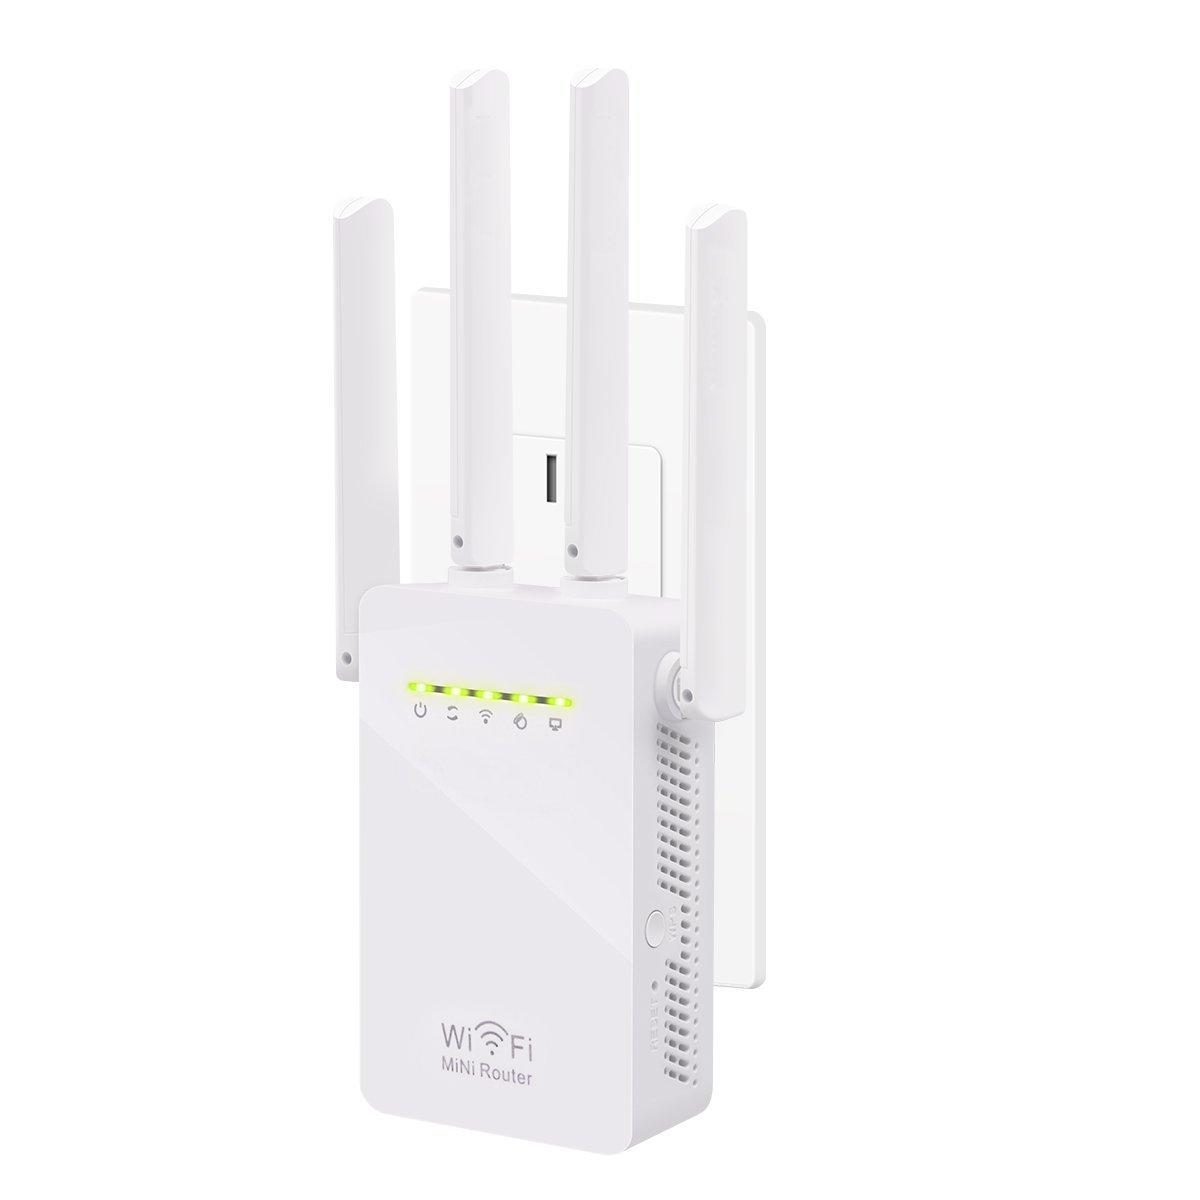 Mua sản phẩm Wifi Repeater, KeepTpeeK Wifi Range Extender 300Mbps